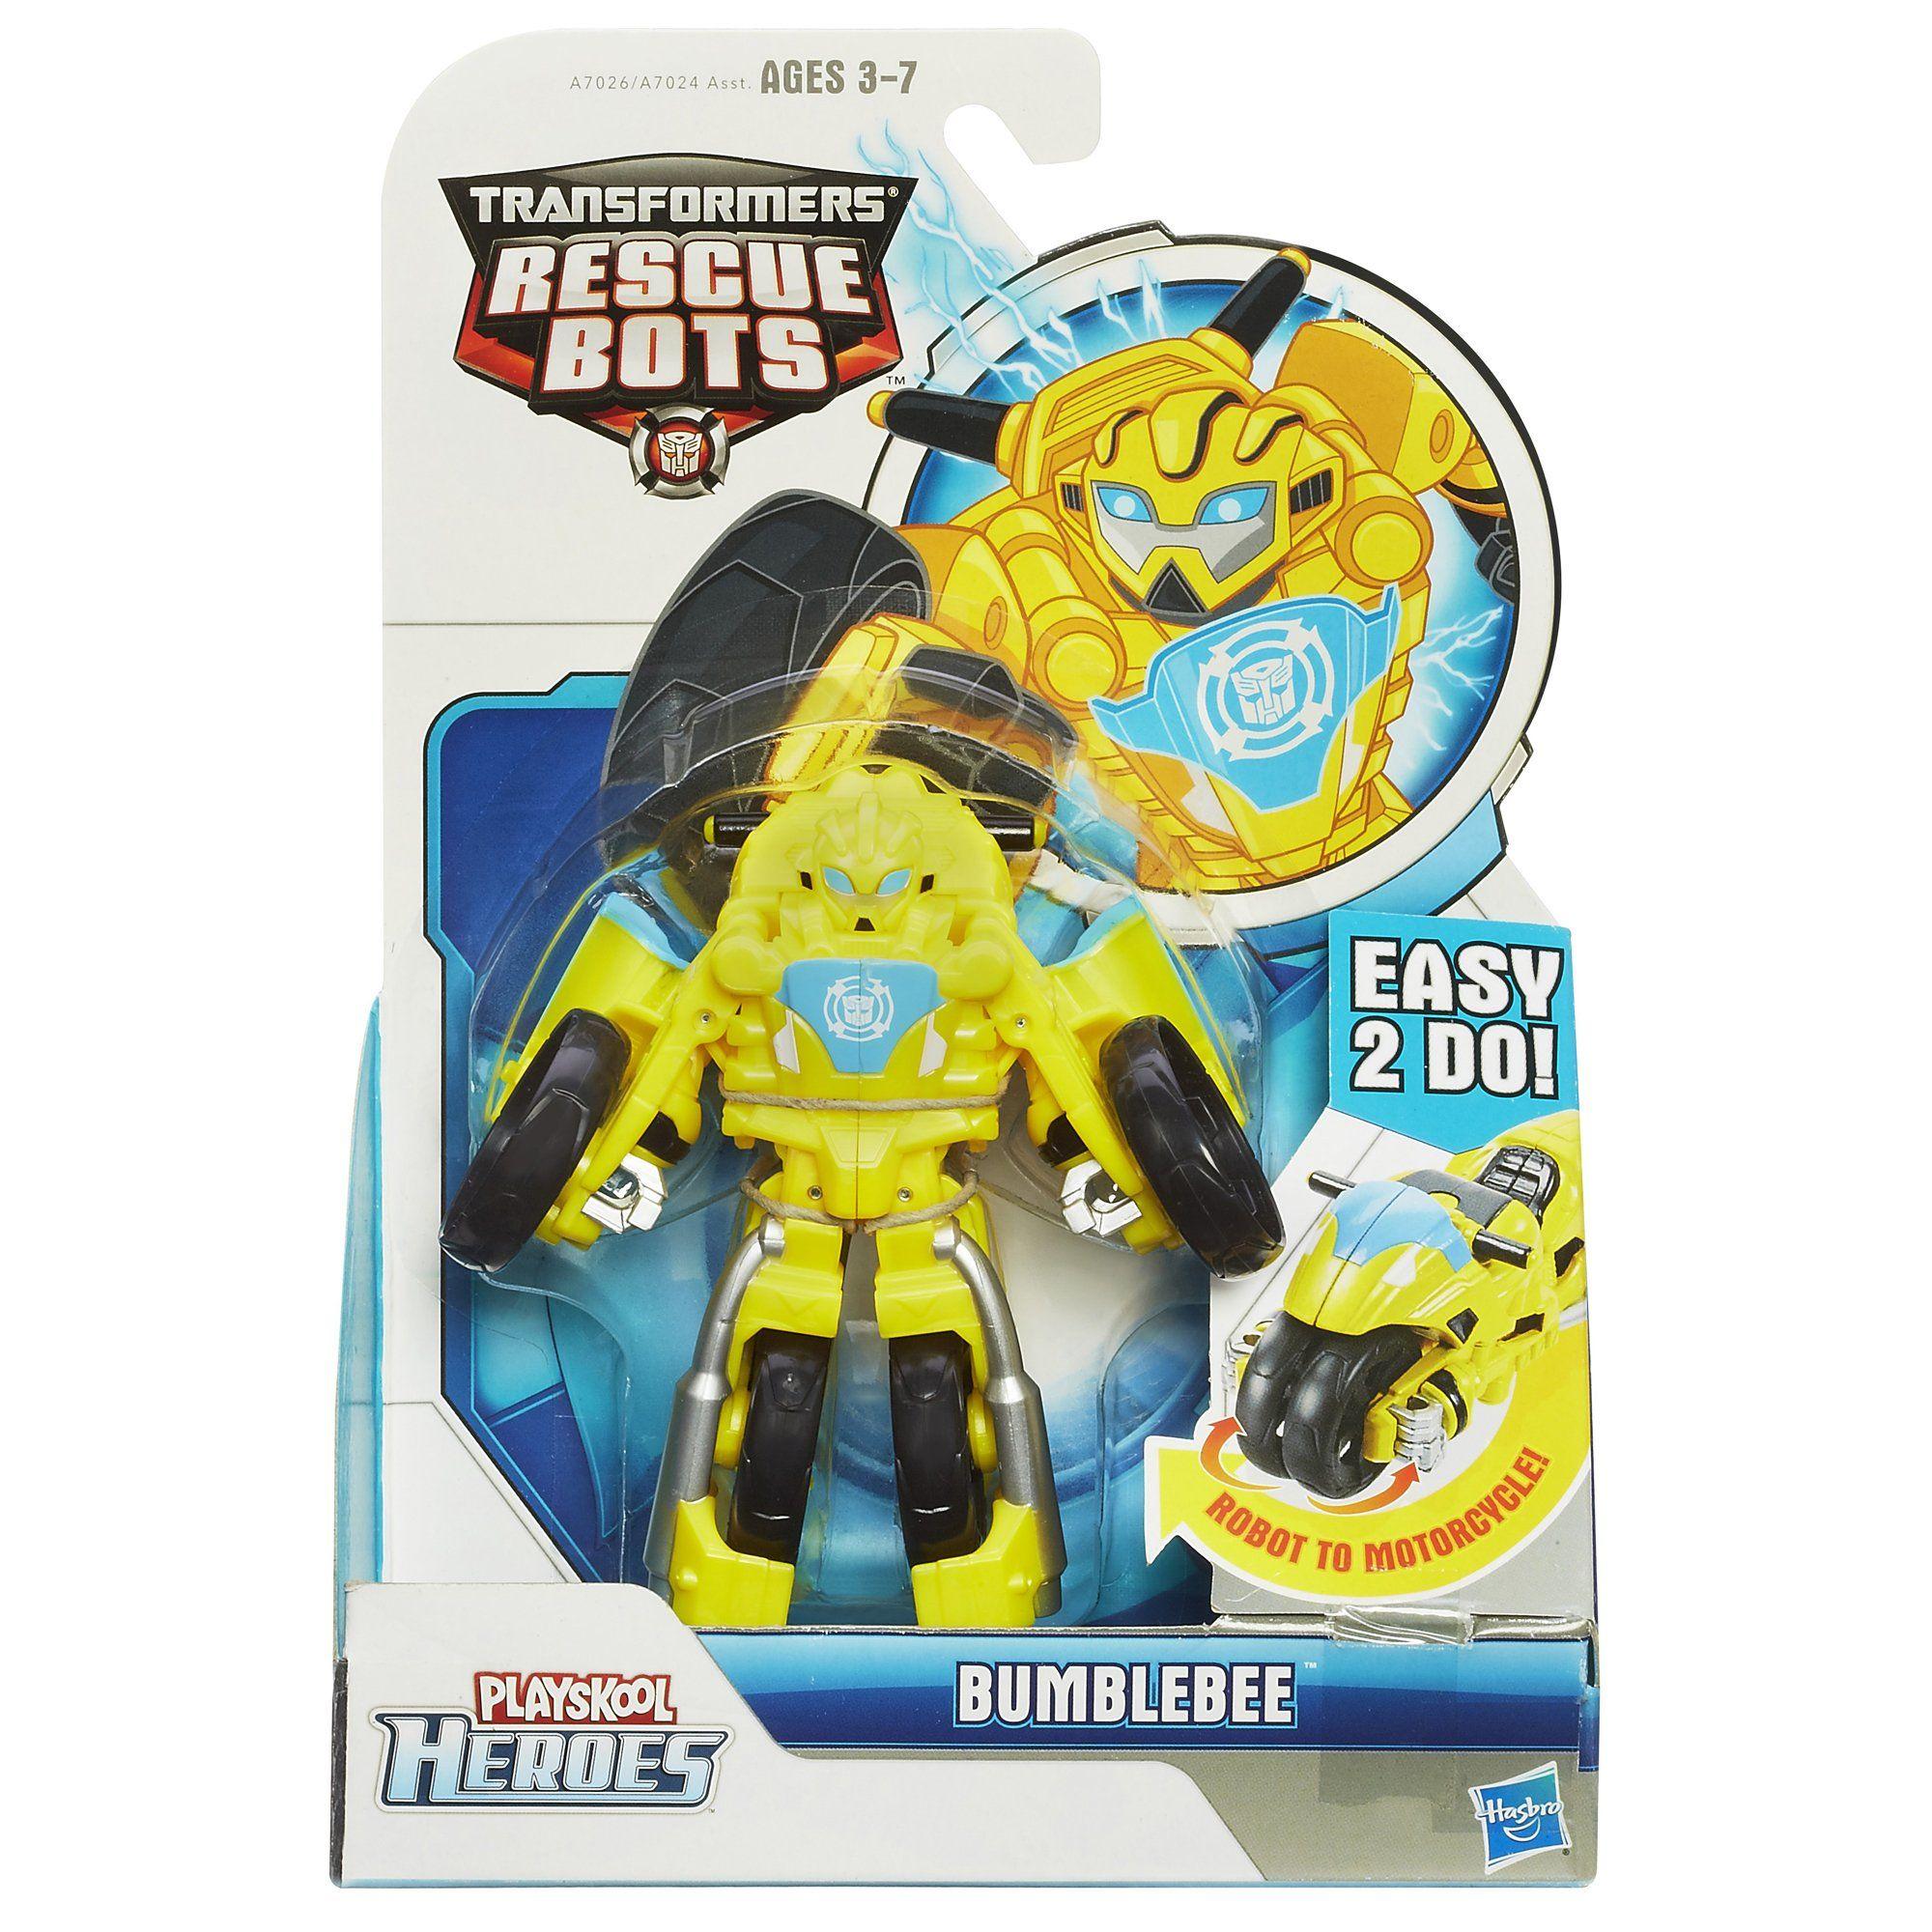 Amazon Com Playskool Heroes Transformers Rescue Bots Bumblebee Figure Motorcycle Toys Games Rescue Bots Transformers Rescue Bots Transformers